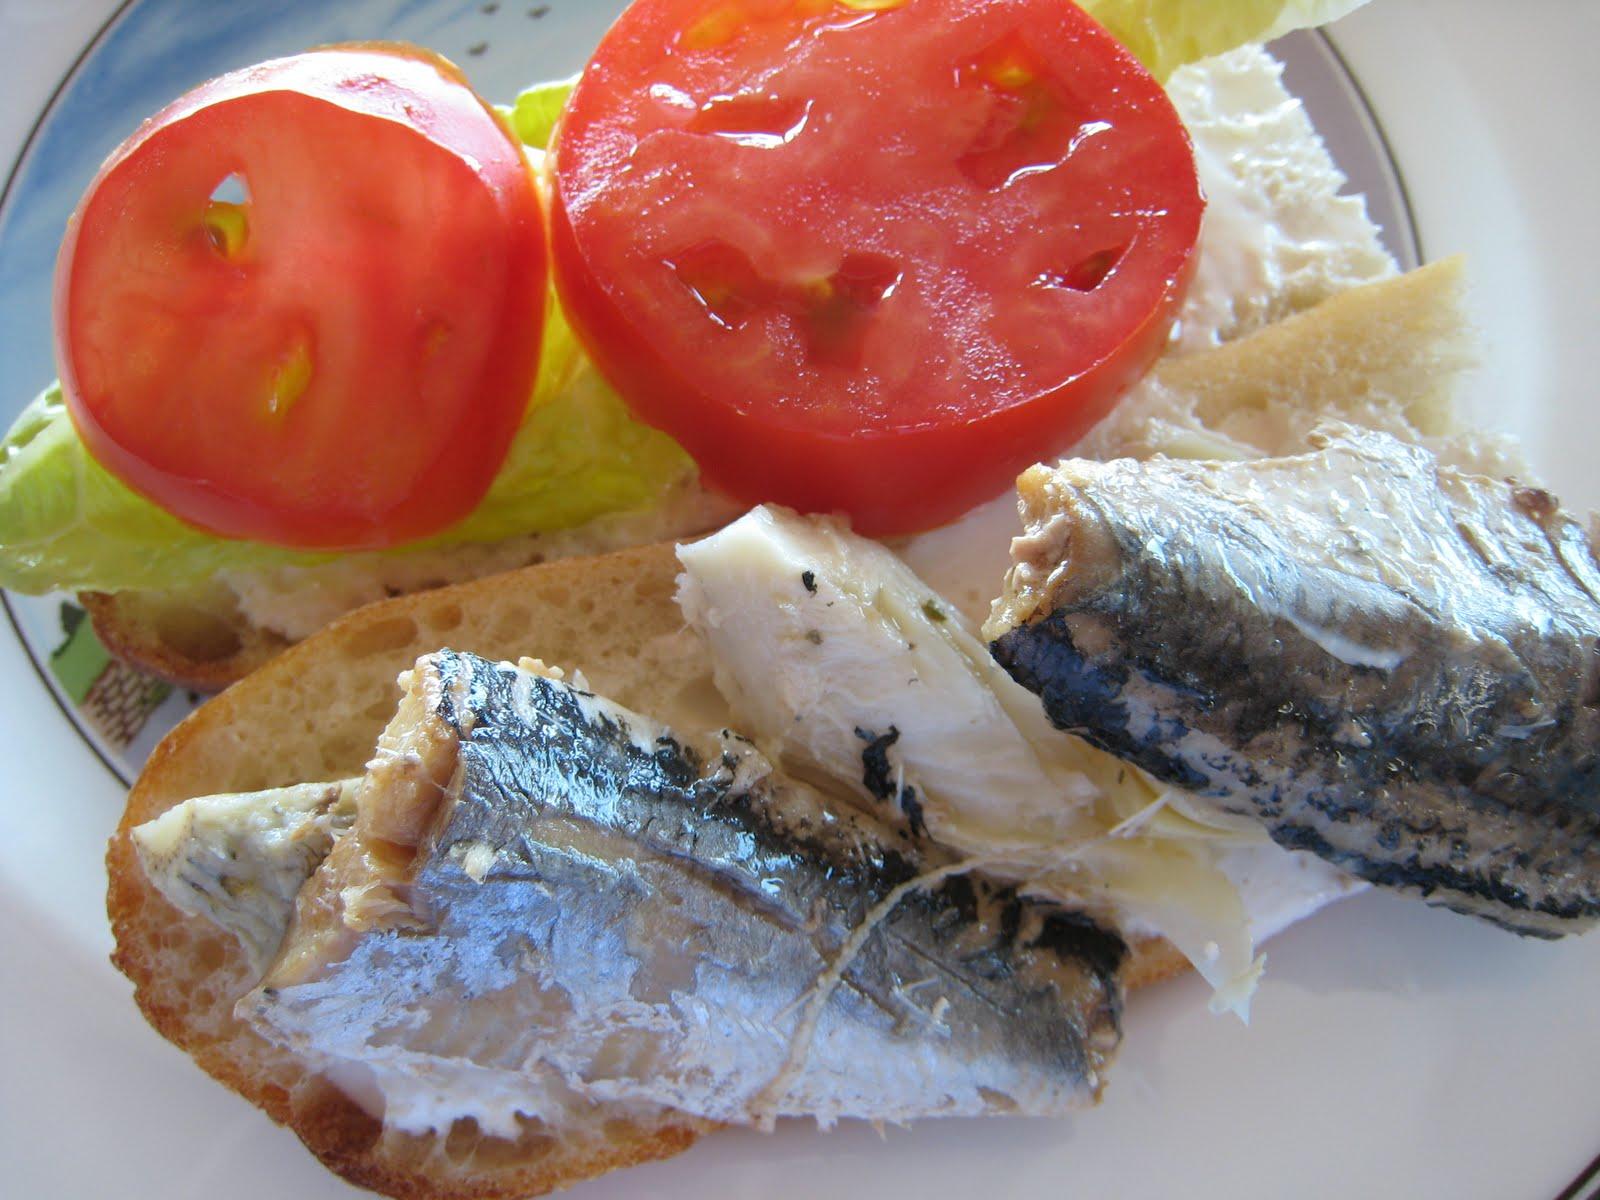 Zoomie station sardine sandy for Sardine lunch ideas